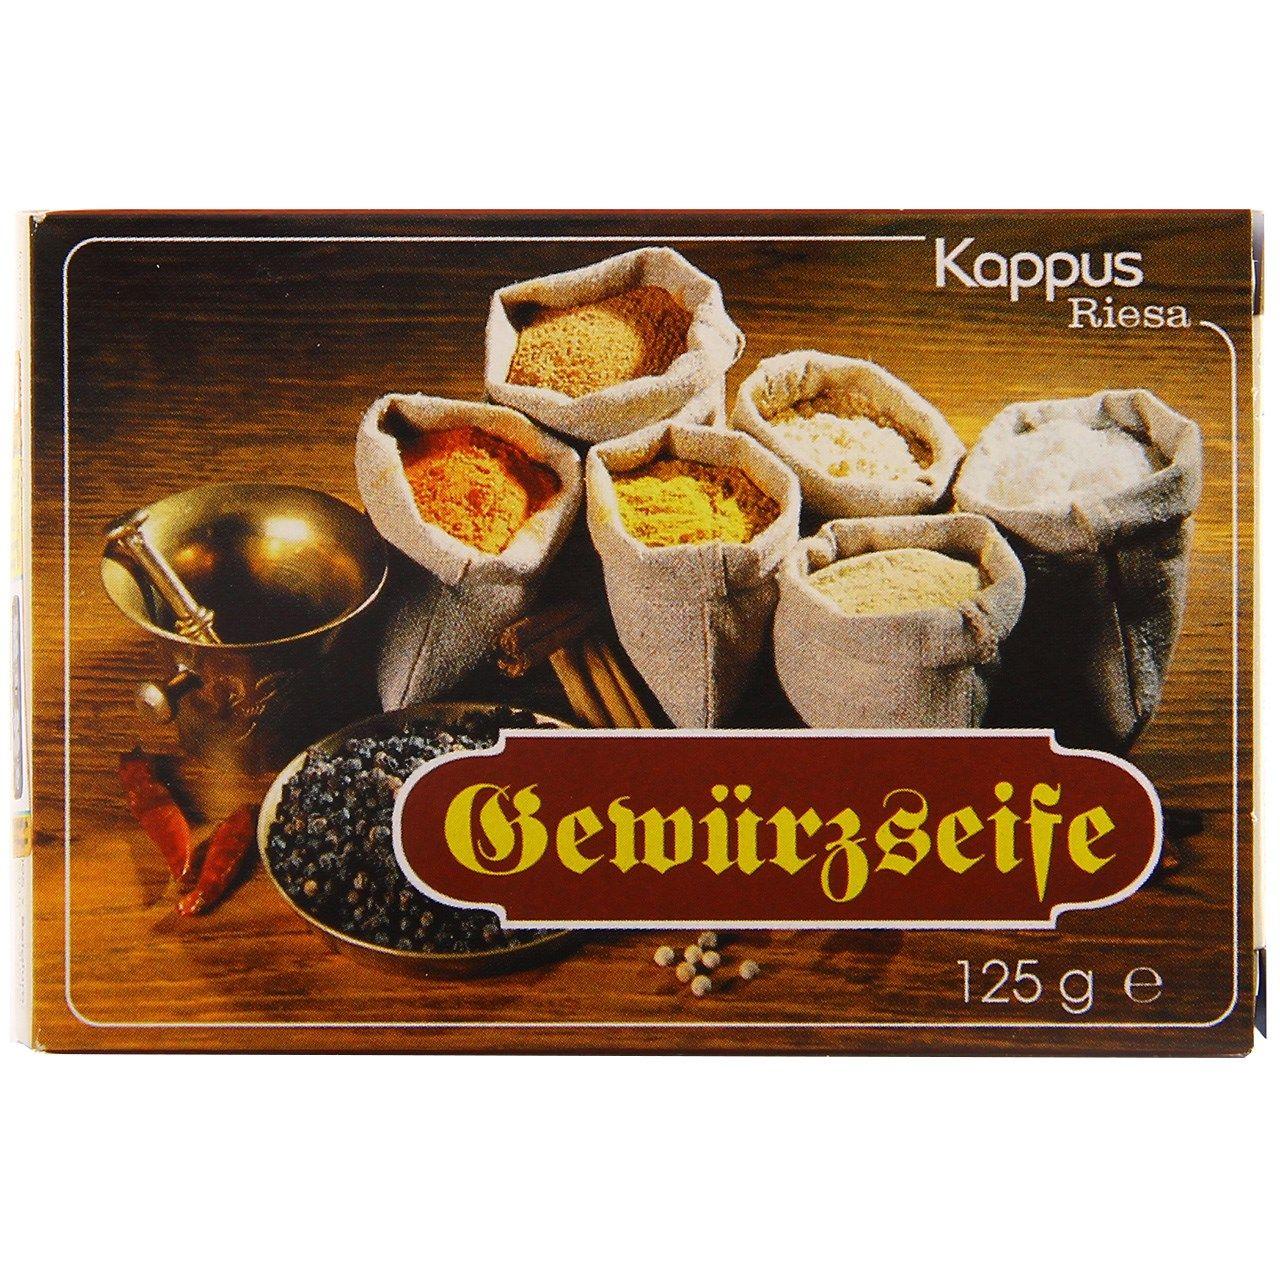 صابون کاپوس مدل Spicy Soap مقدار 125 گرم -  - 1